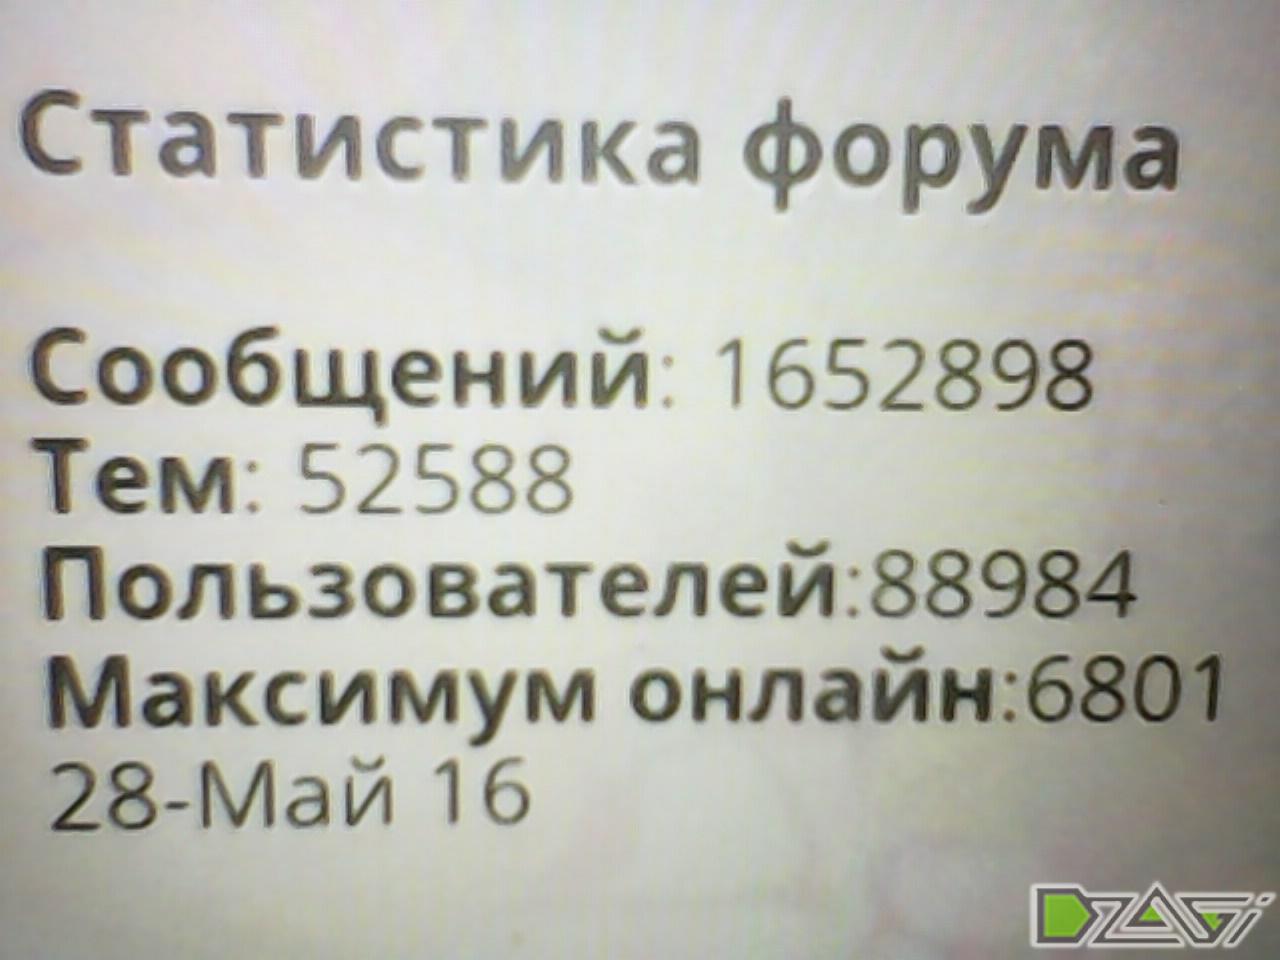 post-7413-0-46684500-1483120947_thumb.jpg